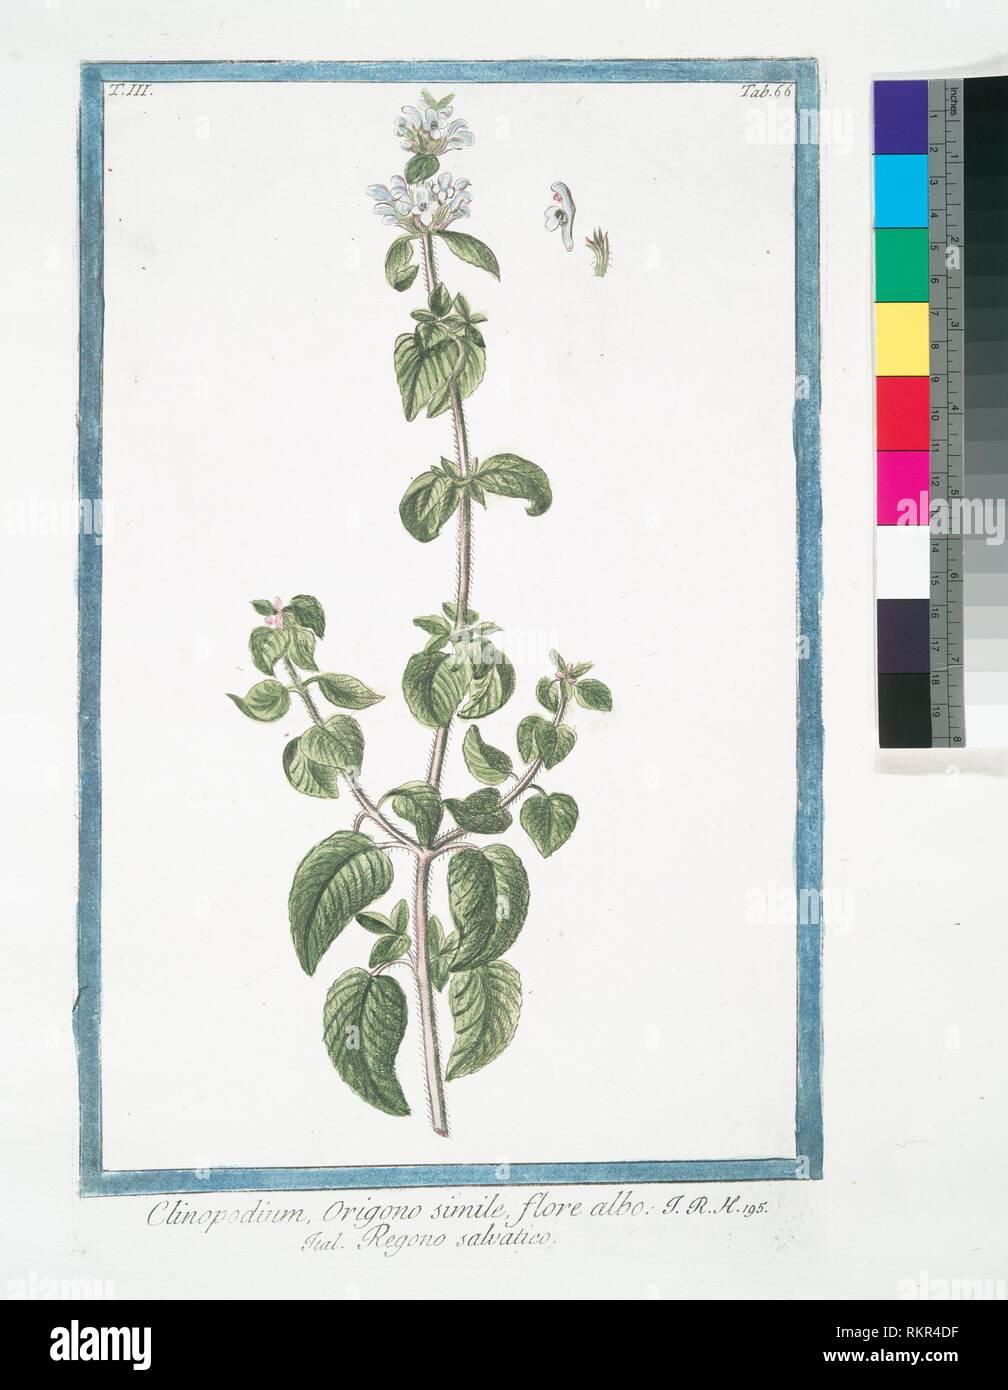 Clinopodium, Origono simile, flore albo = Regono salvatico. [Wild mint]. Bonelli, Giorgio (b. 1724) (Author) Martelli, Niccoló (1735-1829) (Editor). - Stock Image